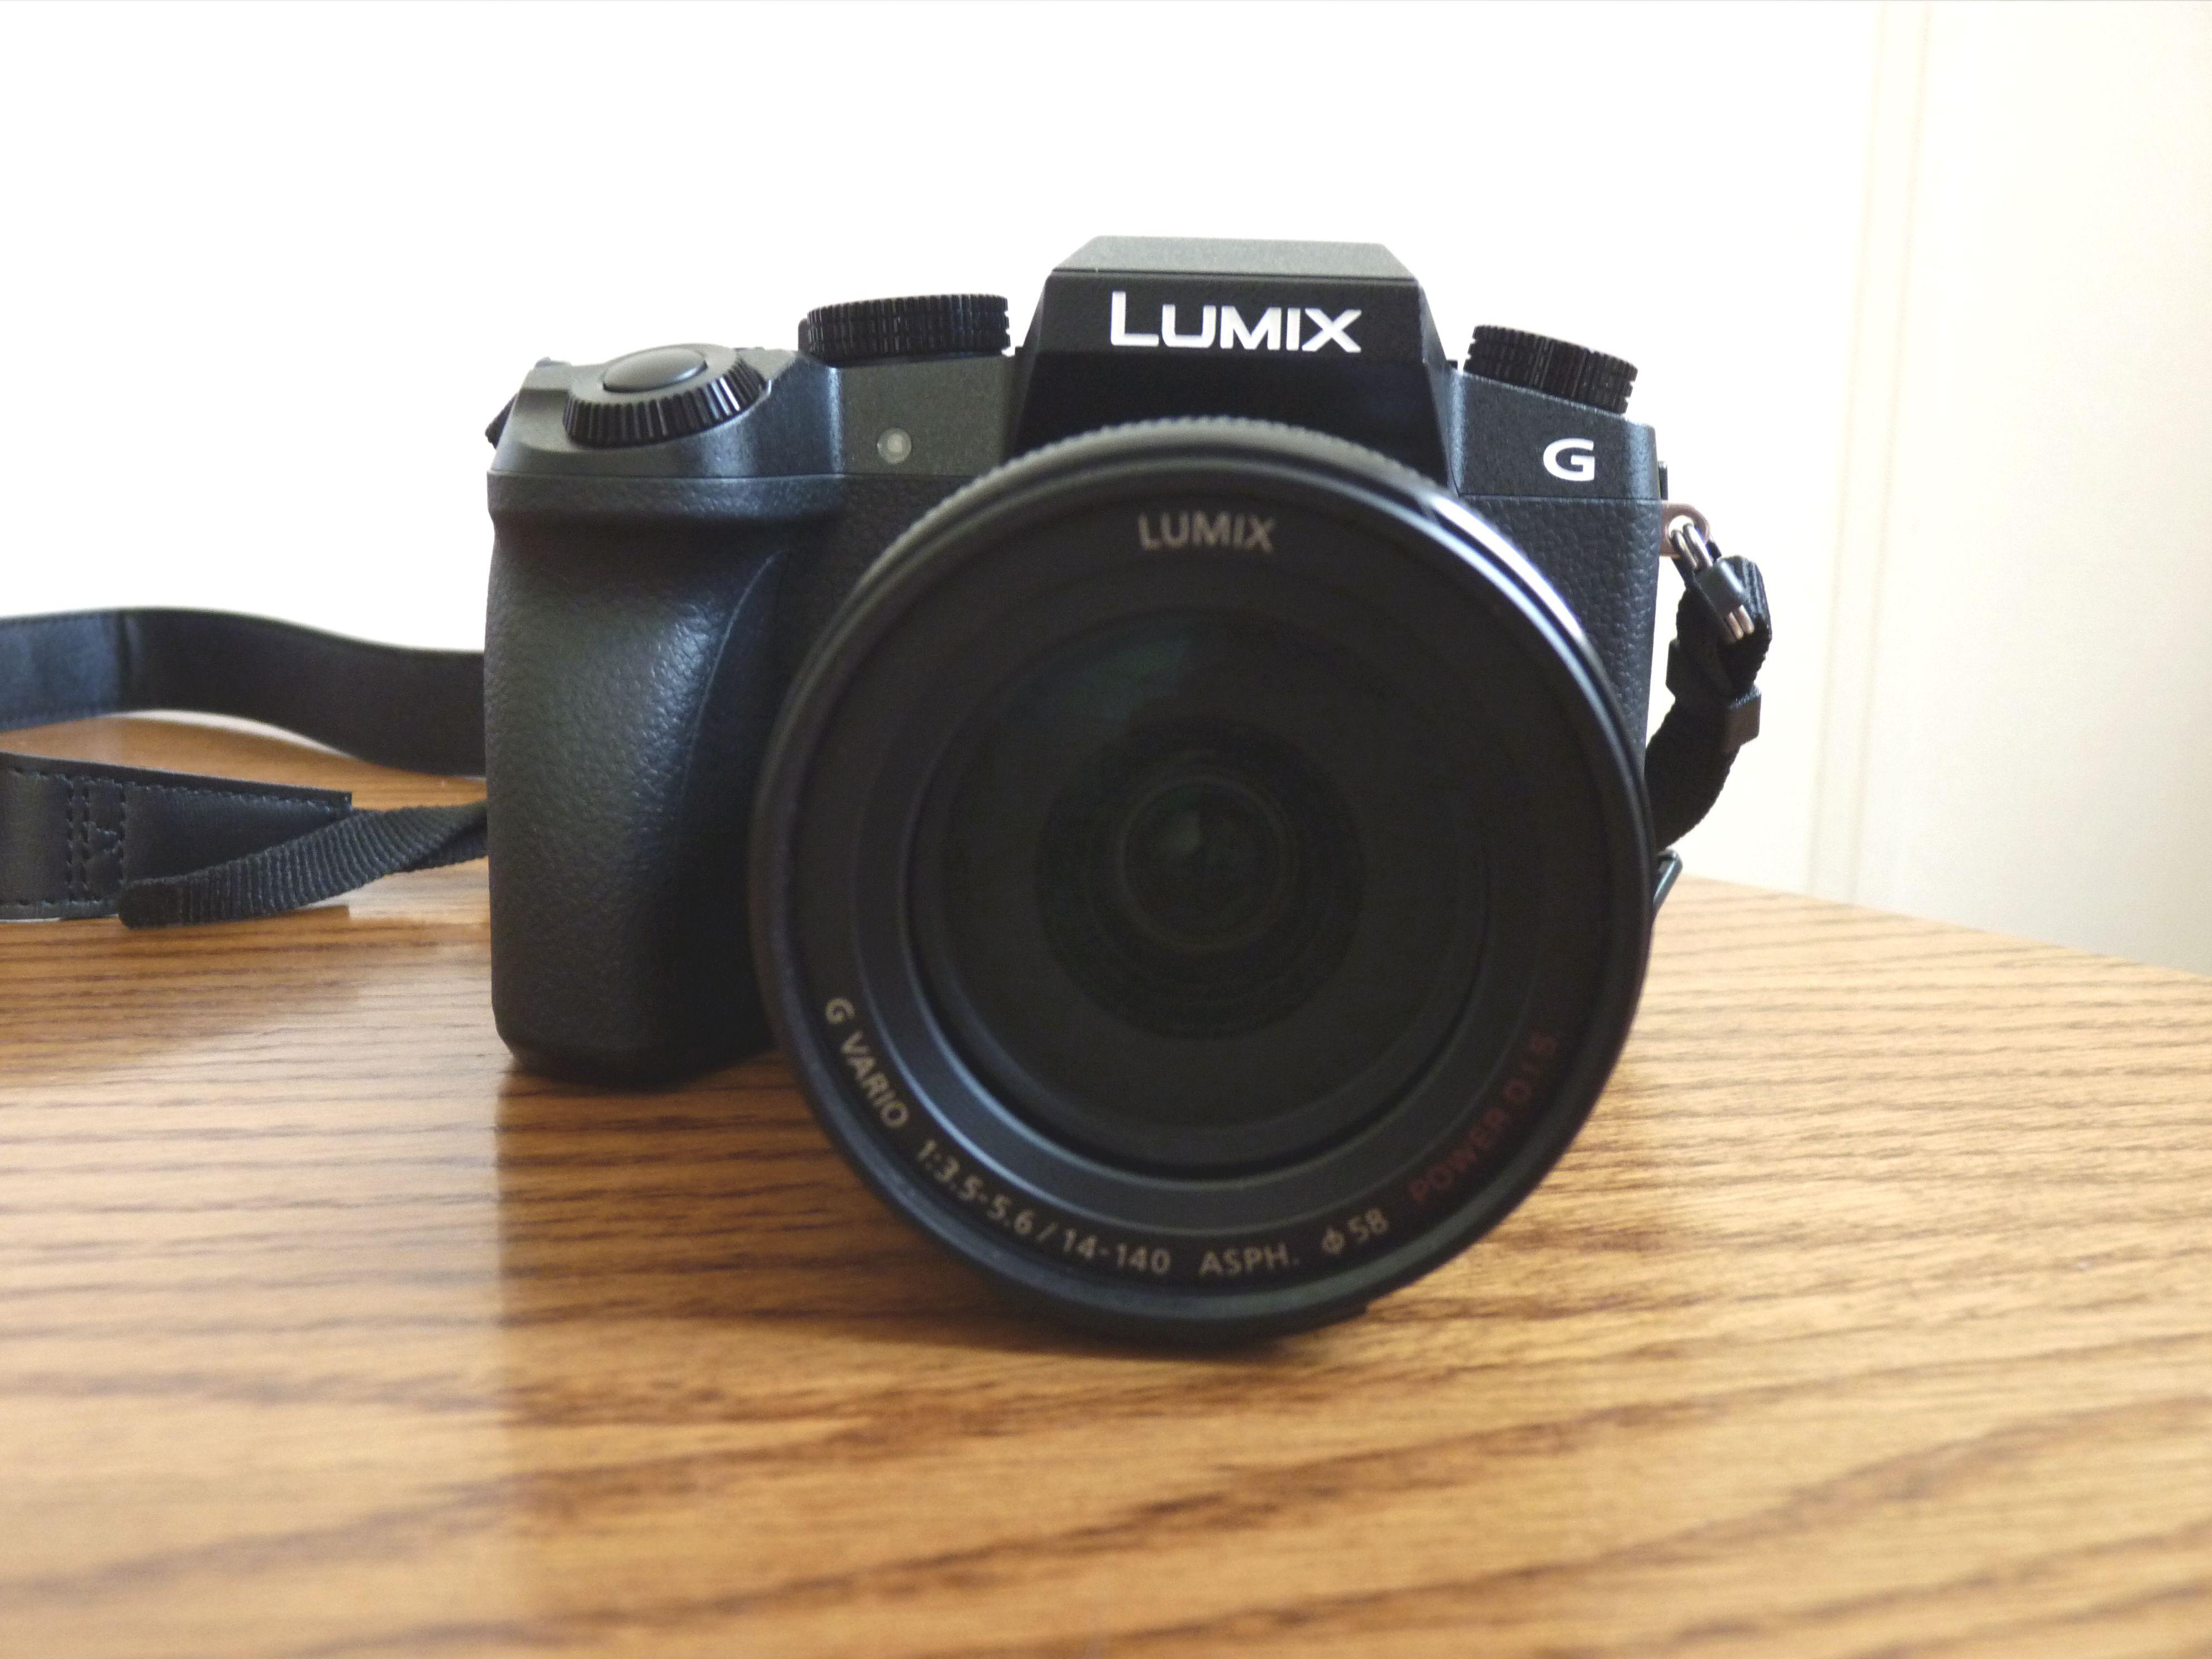 Panasonic Lumix DMC-G7 vu de face